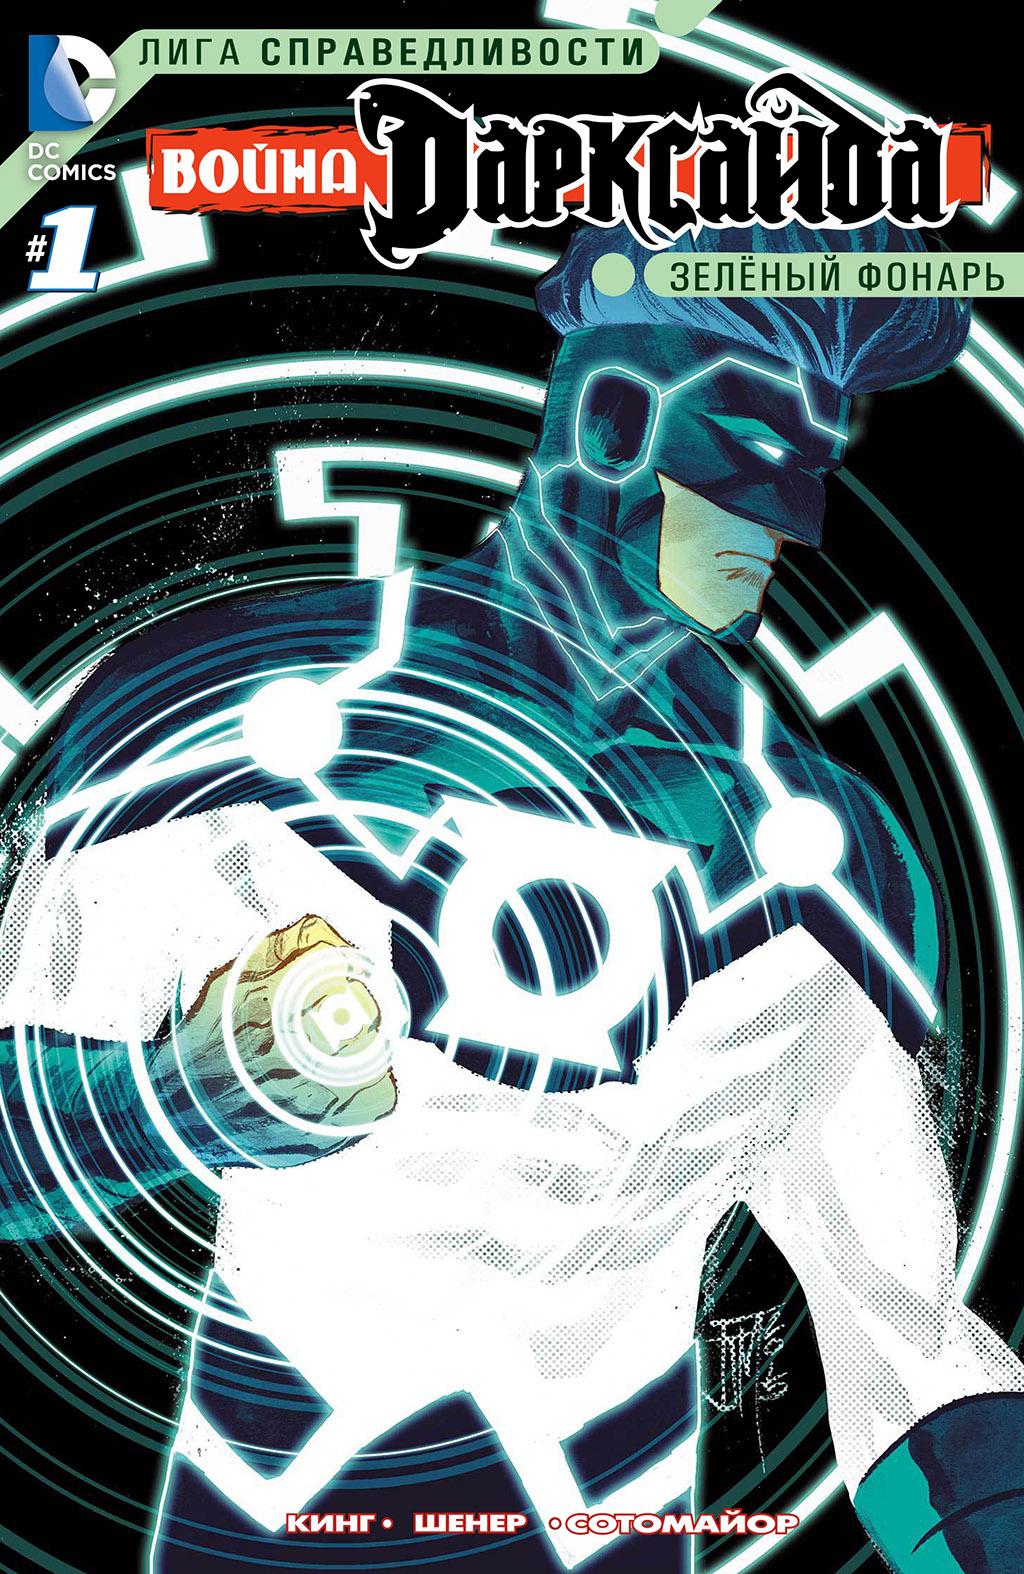 Комикс Лига Справедливости: Война Дарксайда